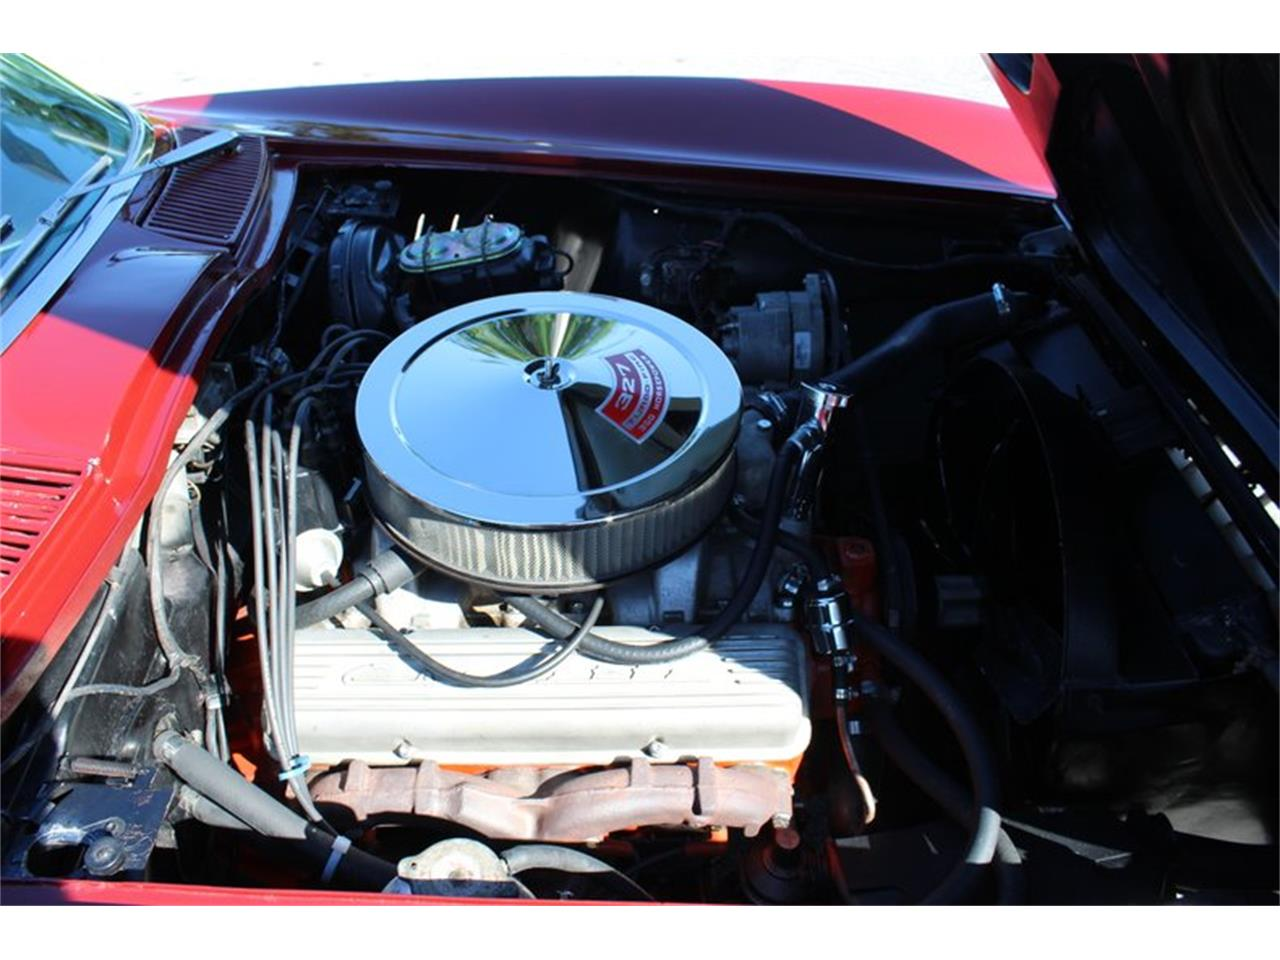 Large Picture of Classic '67 Corvette Stingray located in Sarasota Florida - $54,900.00 - PVTL